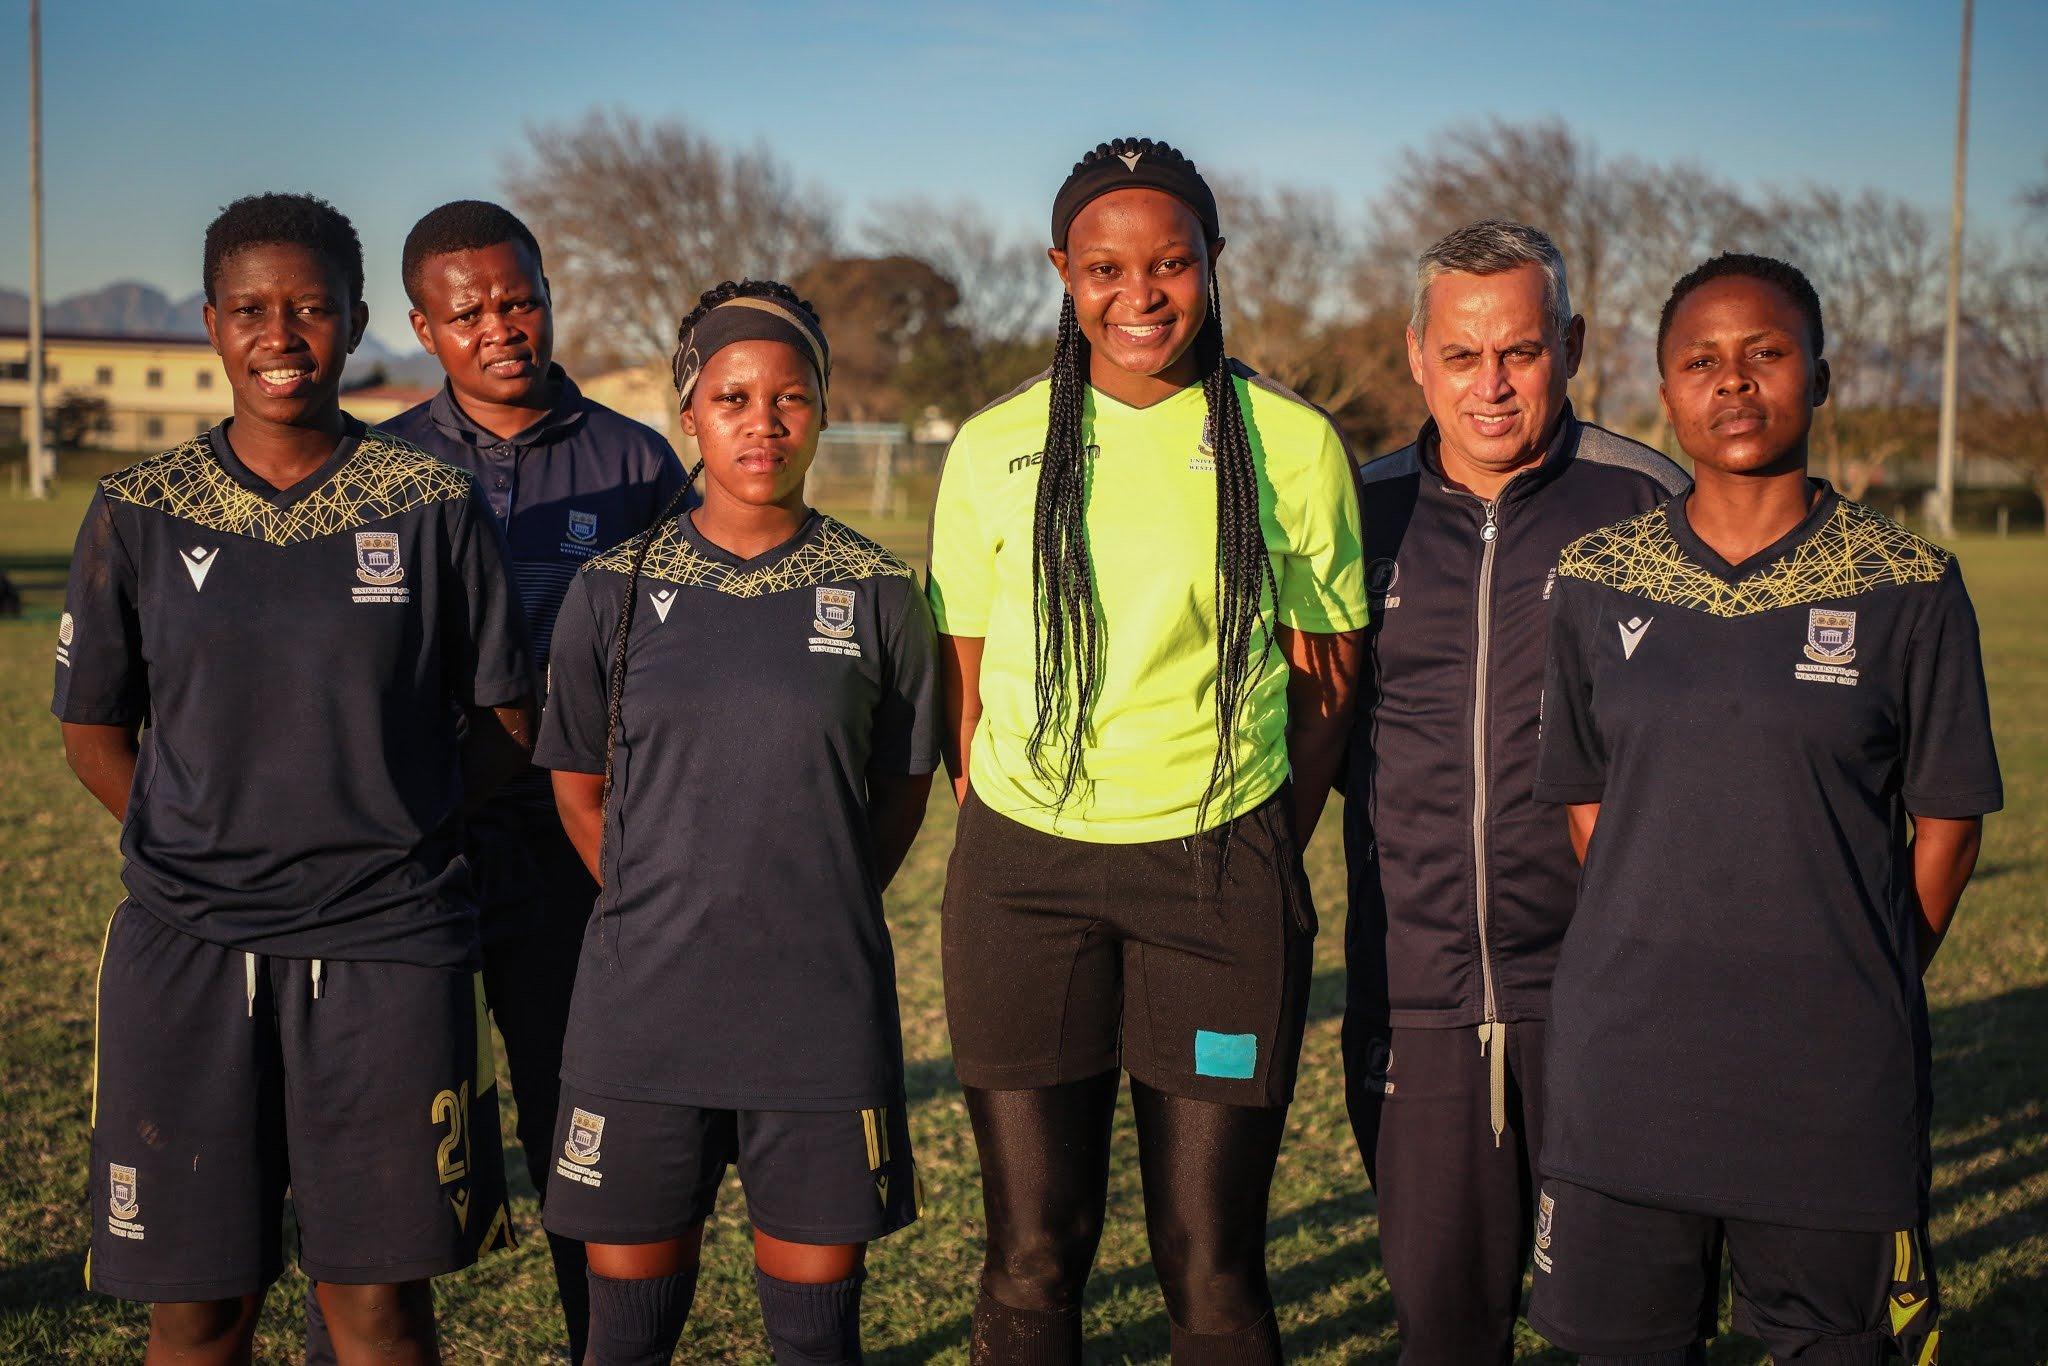 UWC head coach Thinasonke Mbuli with her Banyana Banyana players